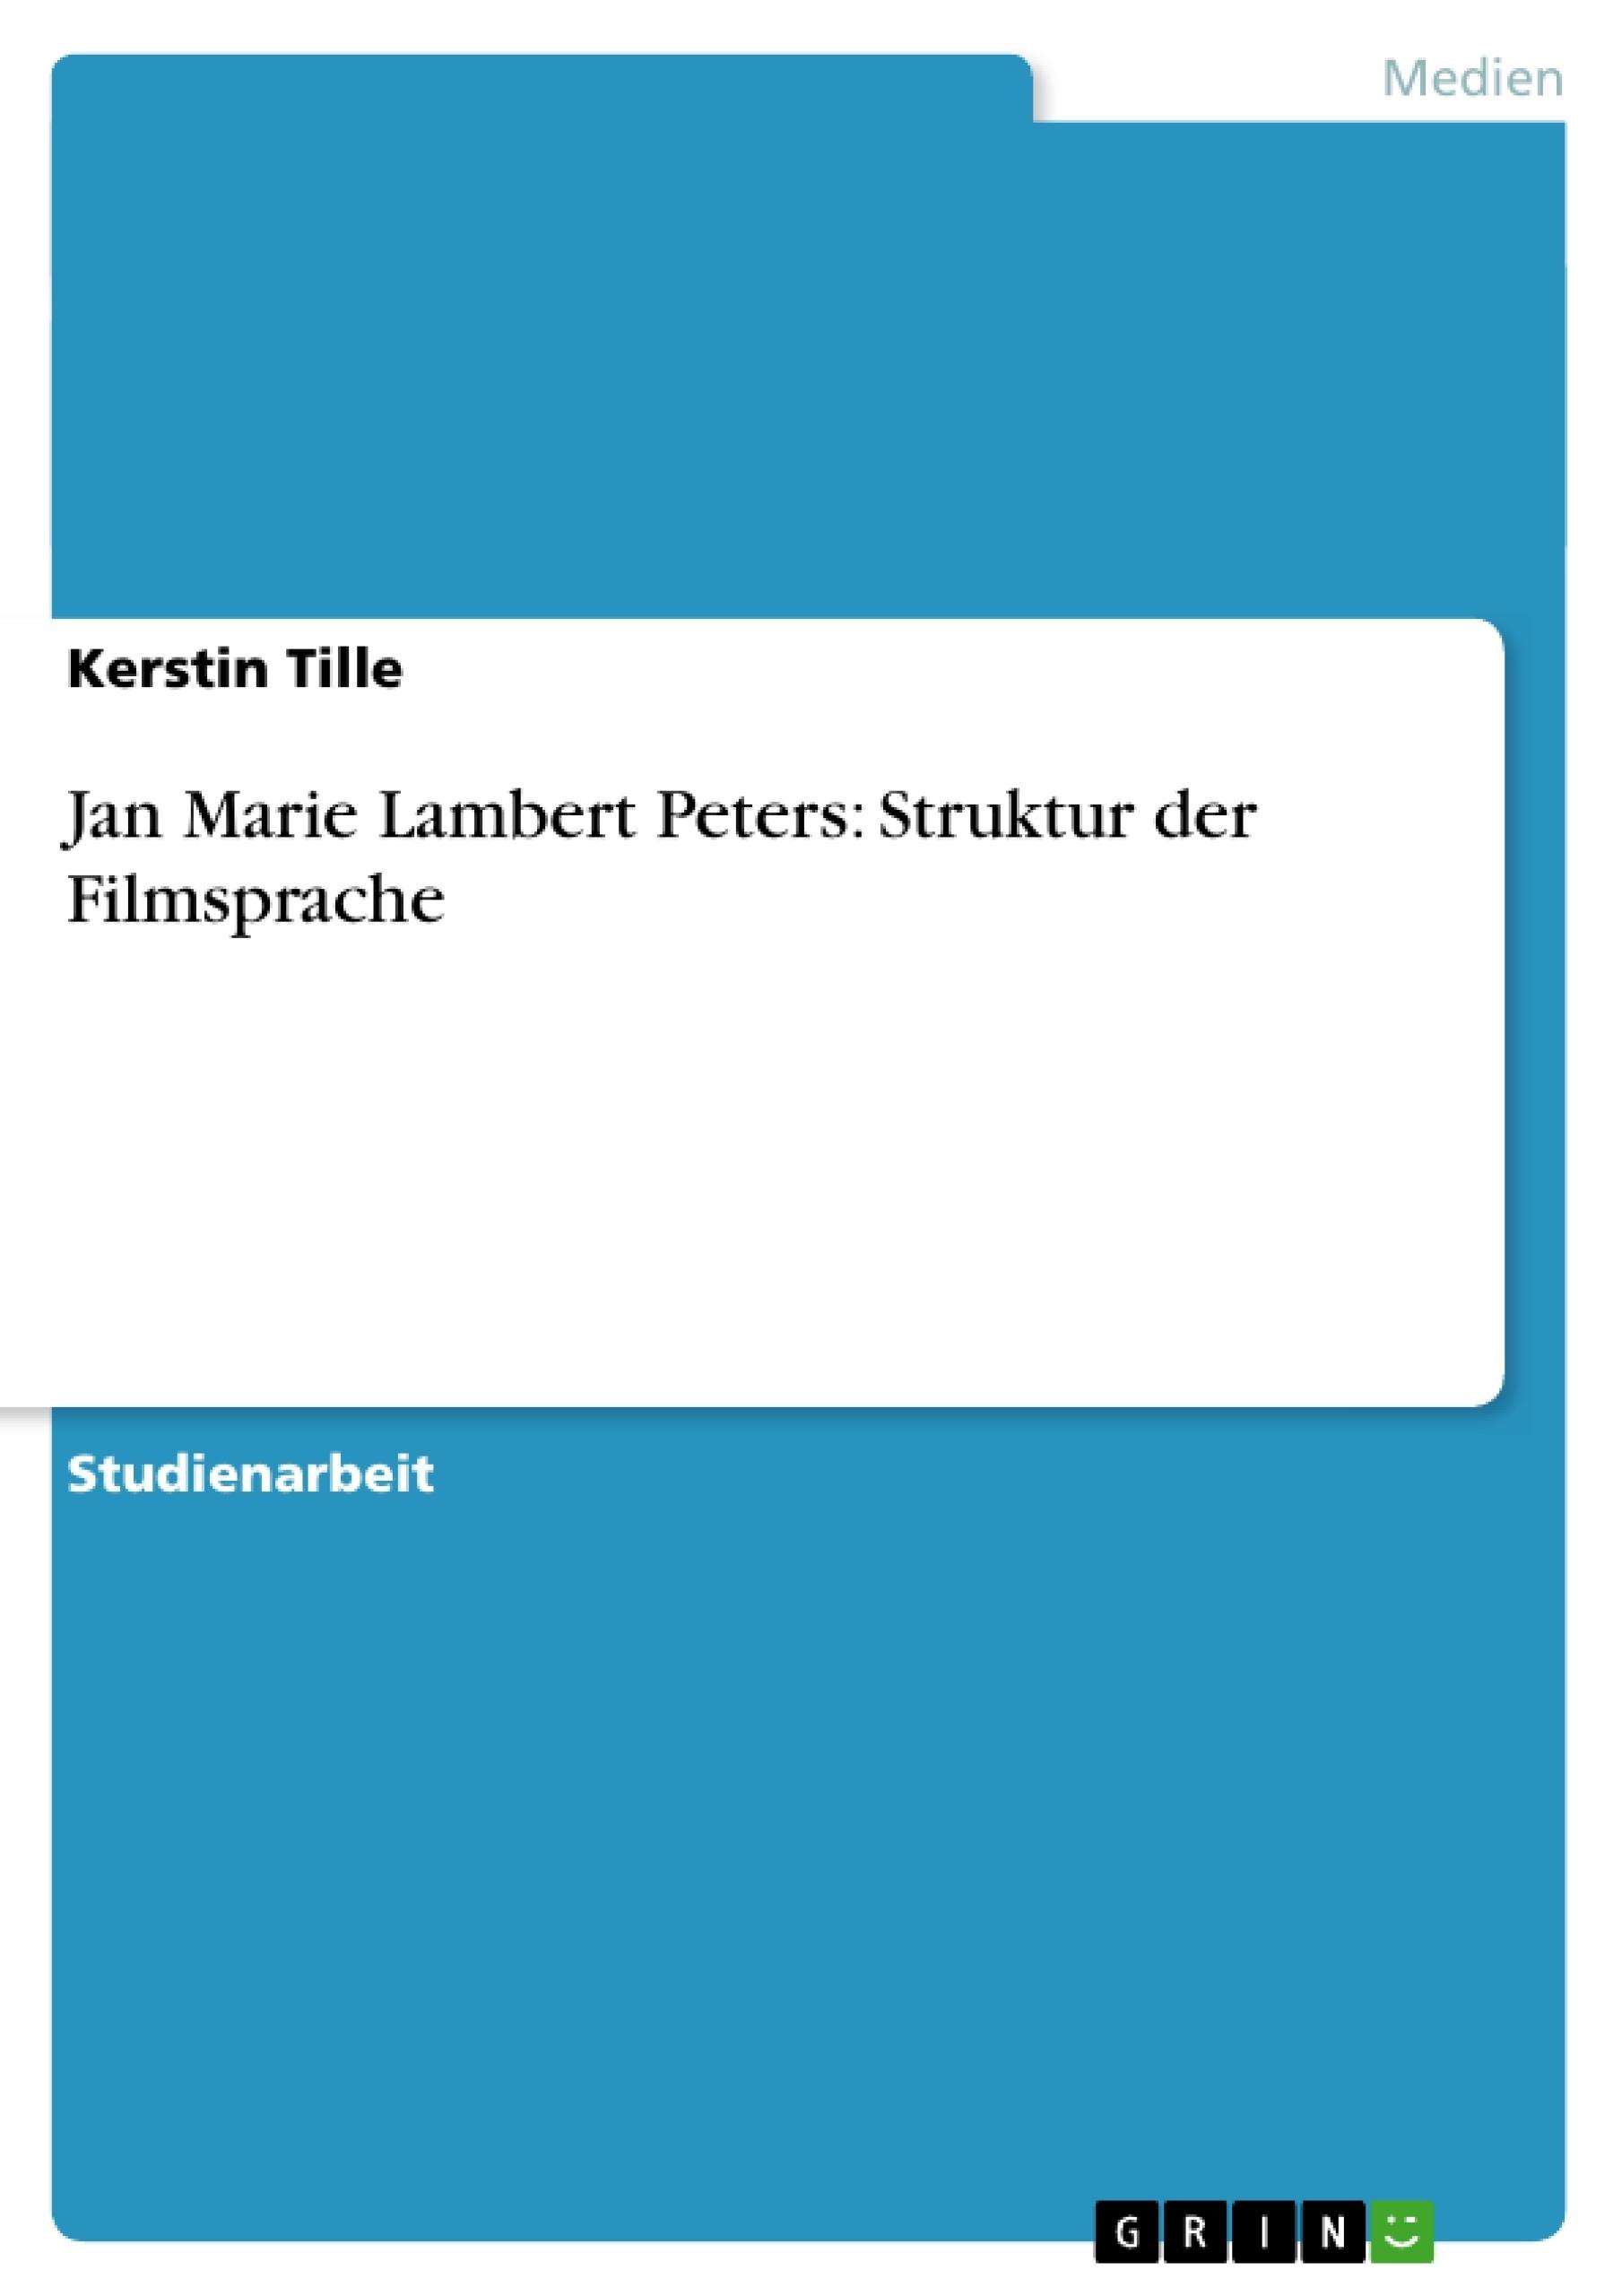 Titel: Jan Marie Lambert Peters: Struktur der Filmsprache